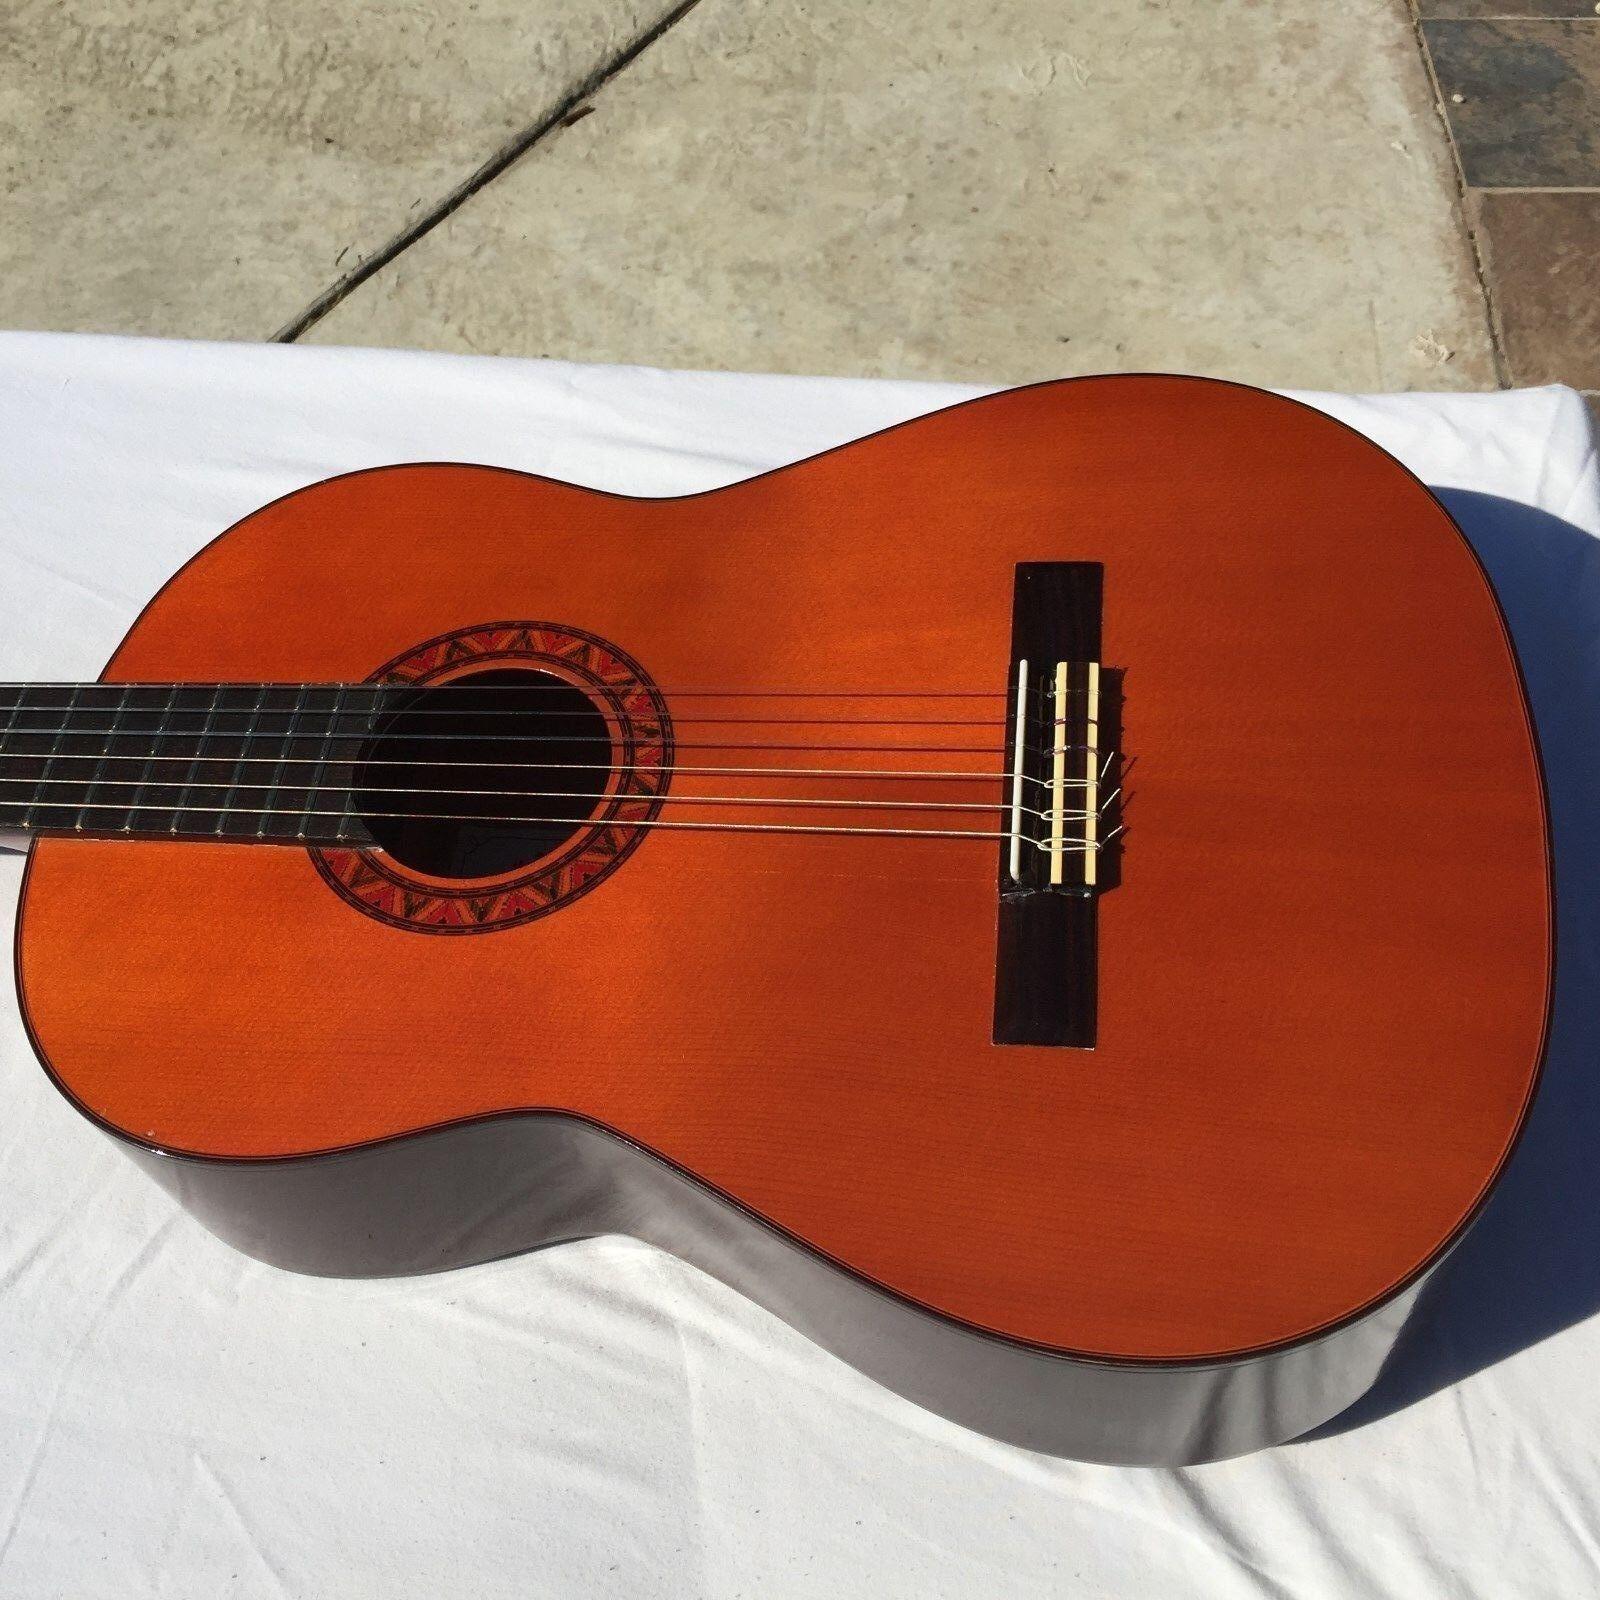 TAKEHARU CONSERVARTE 441 Classical Guitar with case, Japan